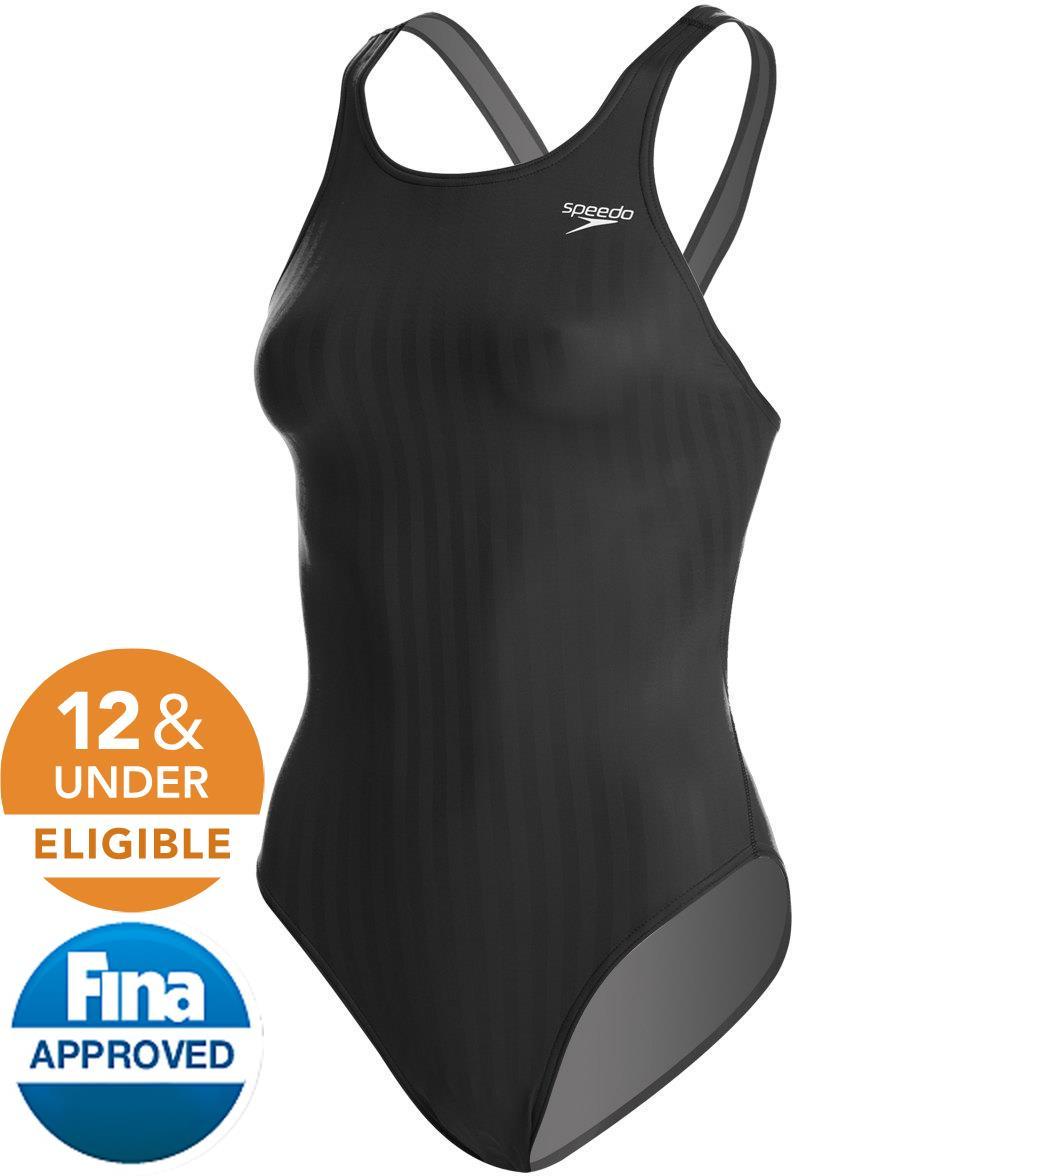 Speedo Women's Aquablade Recordbreaker Tech Suit Swimsuit